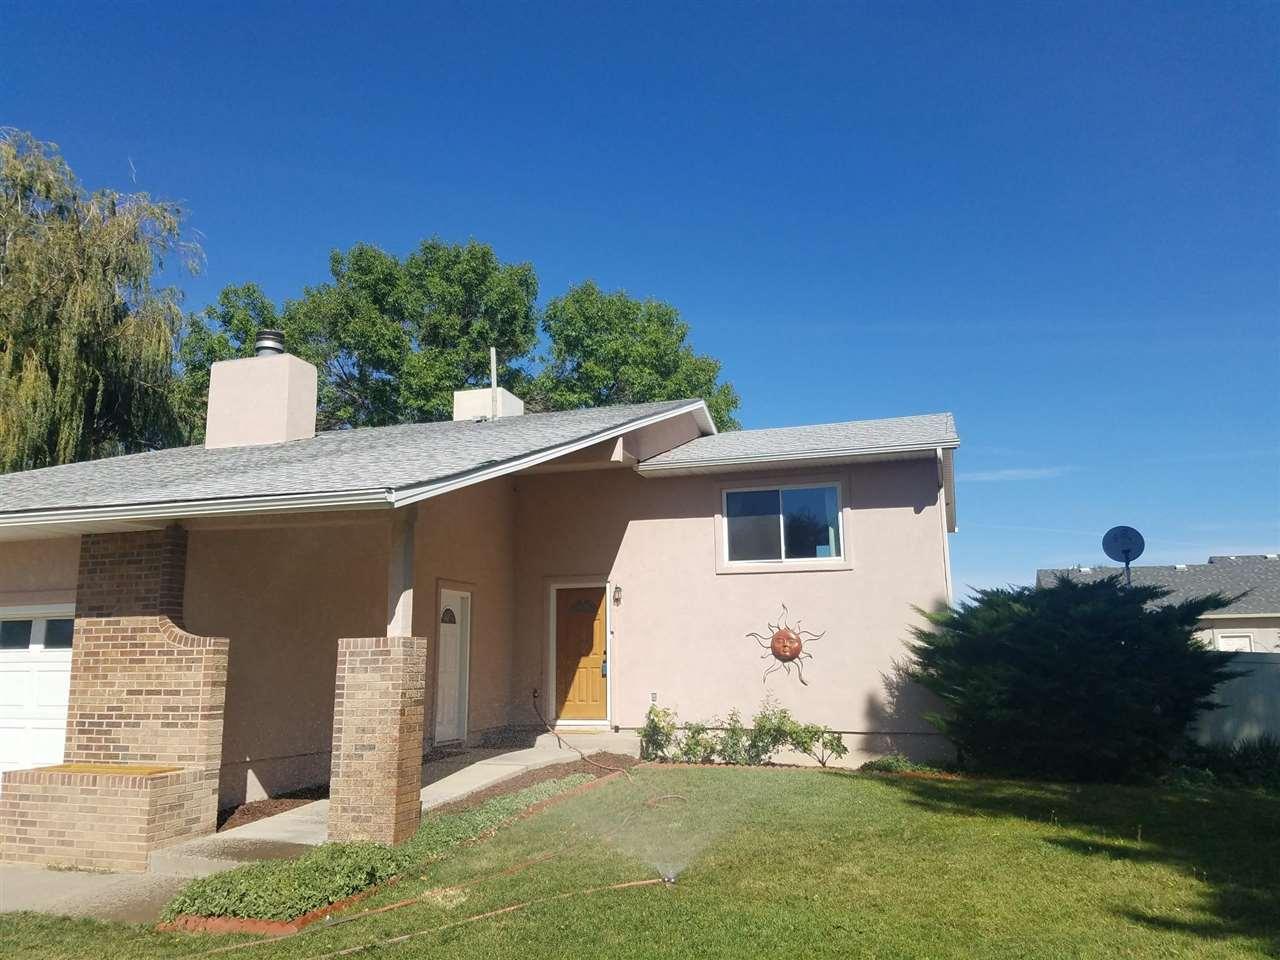 2930 Kathy Jo Lane, Grand Junction, CO 81503